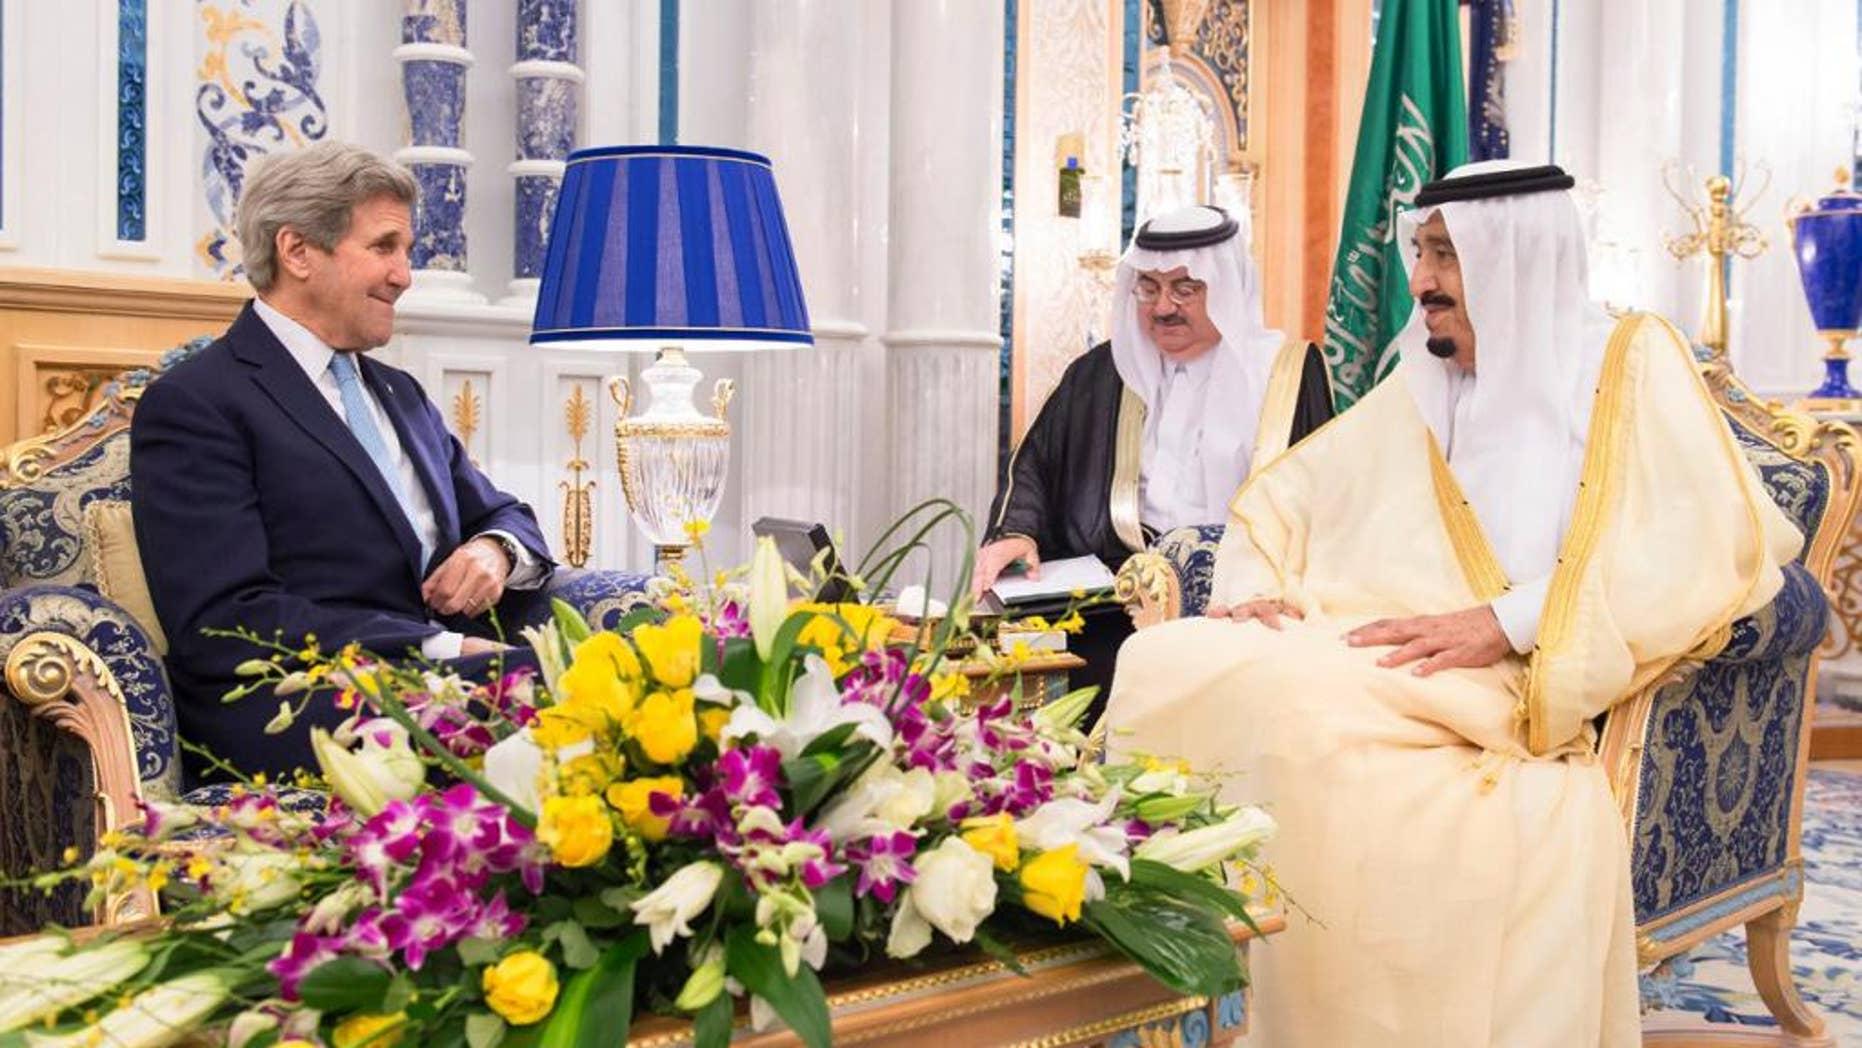 May 15, 2016: Saudi Arabia King Salman bin Abdul Aziz, right, meets with U.S. Secretary of State John Kerry in Jiddah, Saudi Arabia. (Saudi Press Agency via AP)